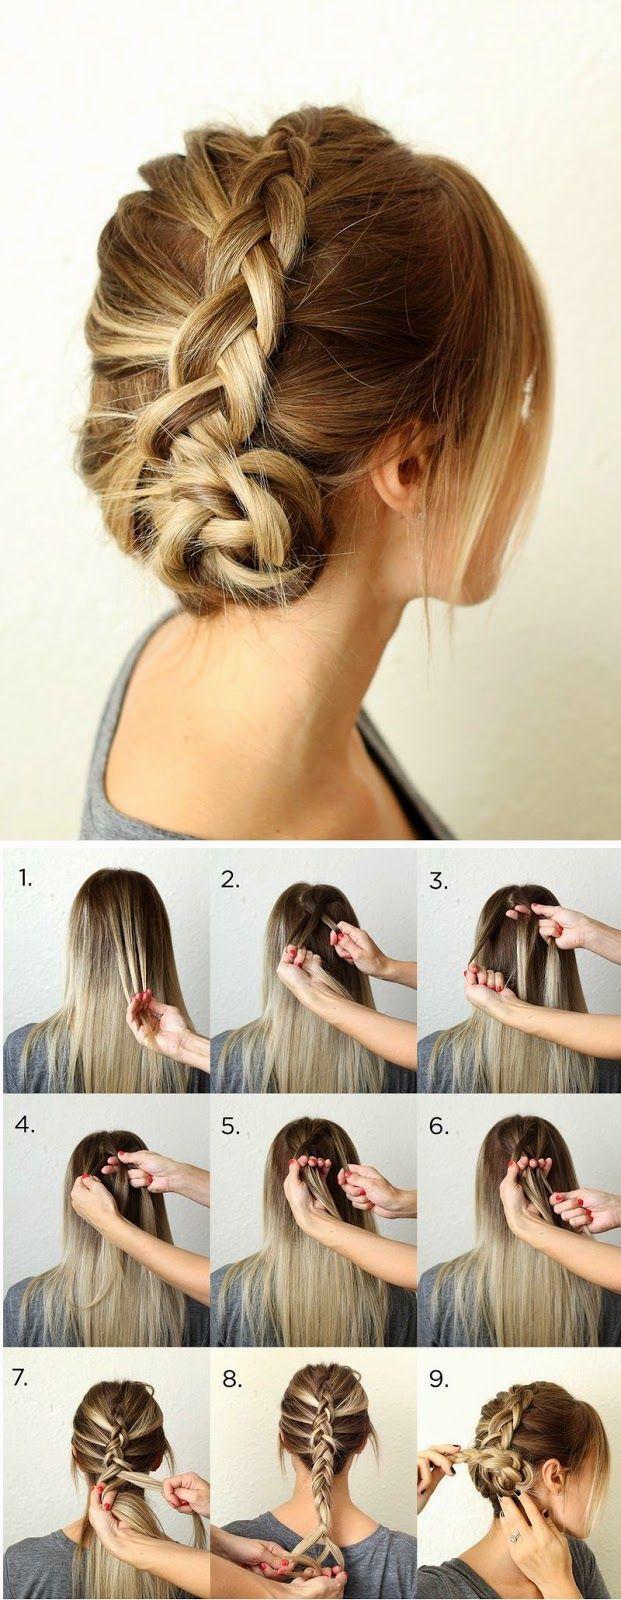 How To : Simple Dutch Braid